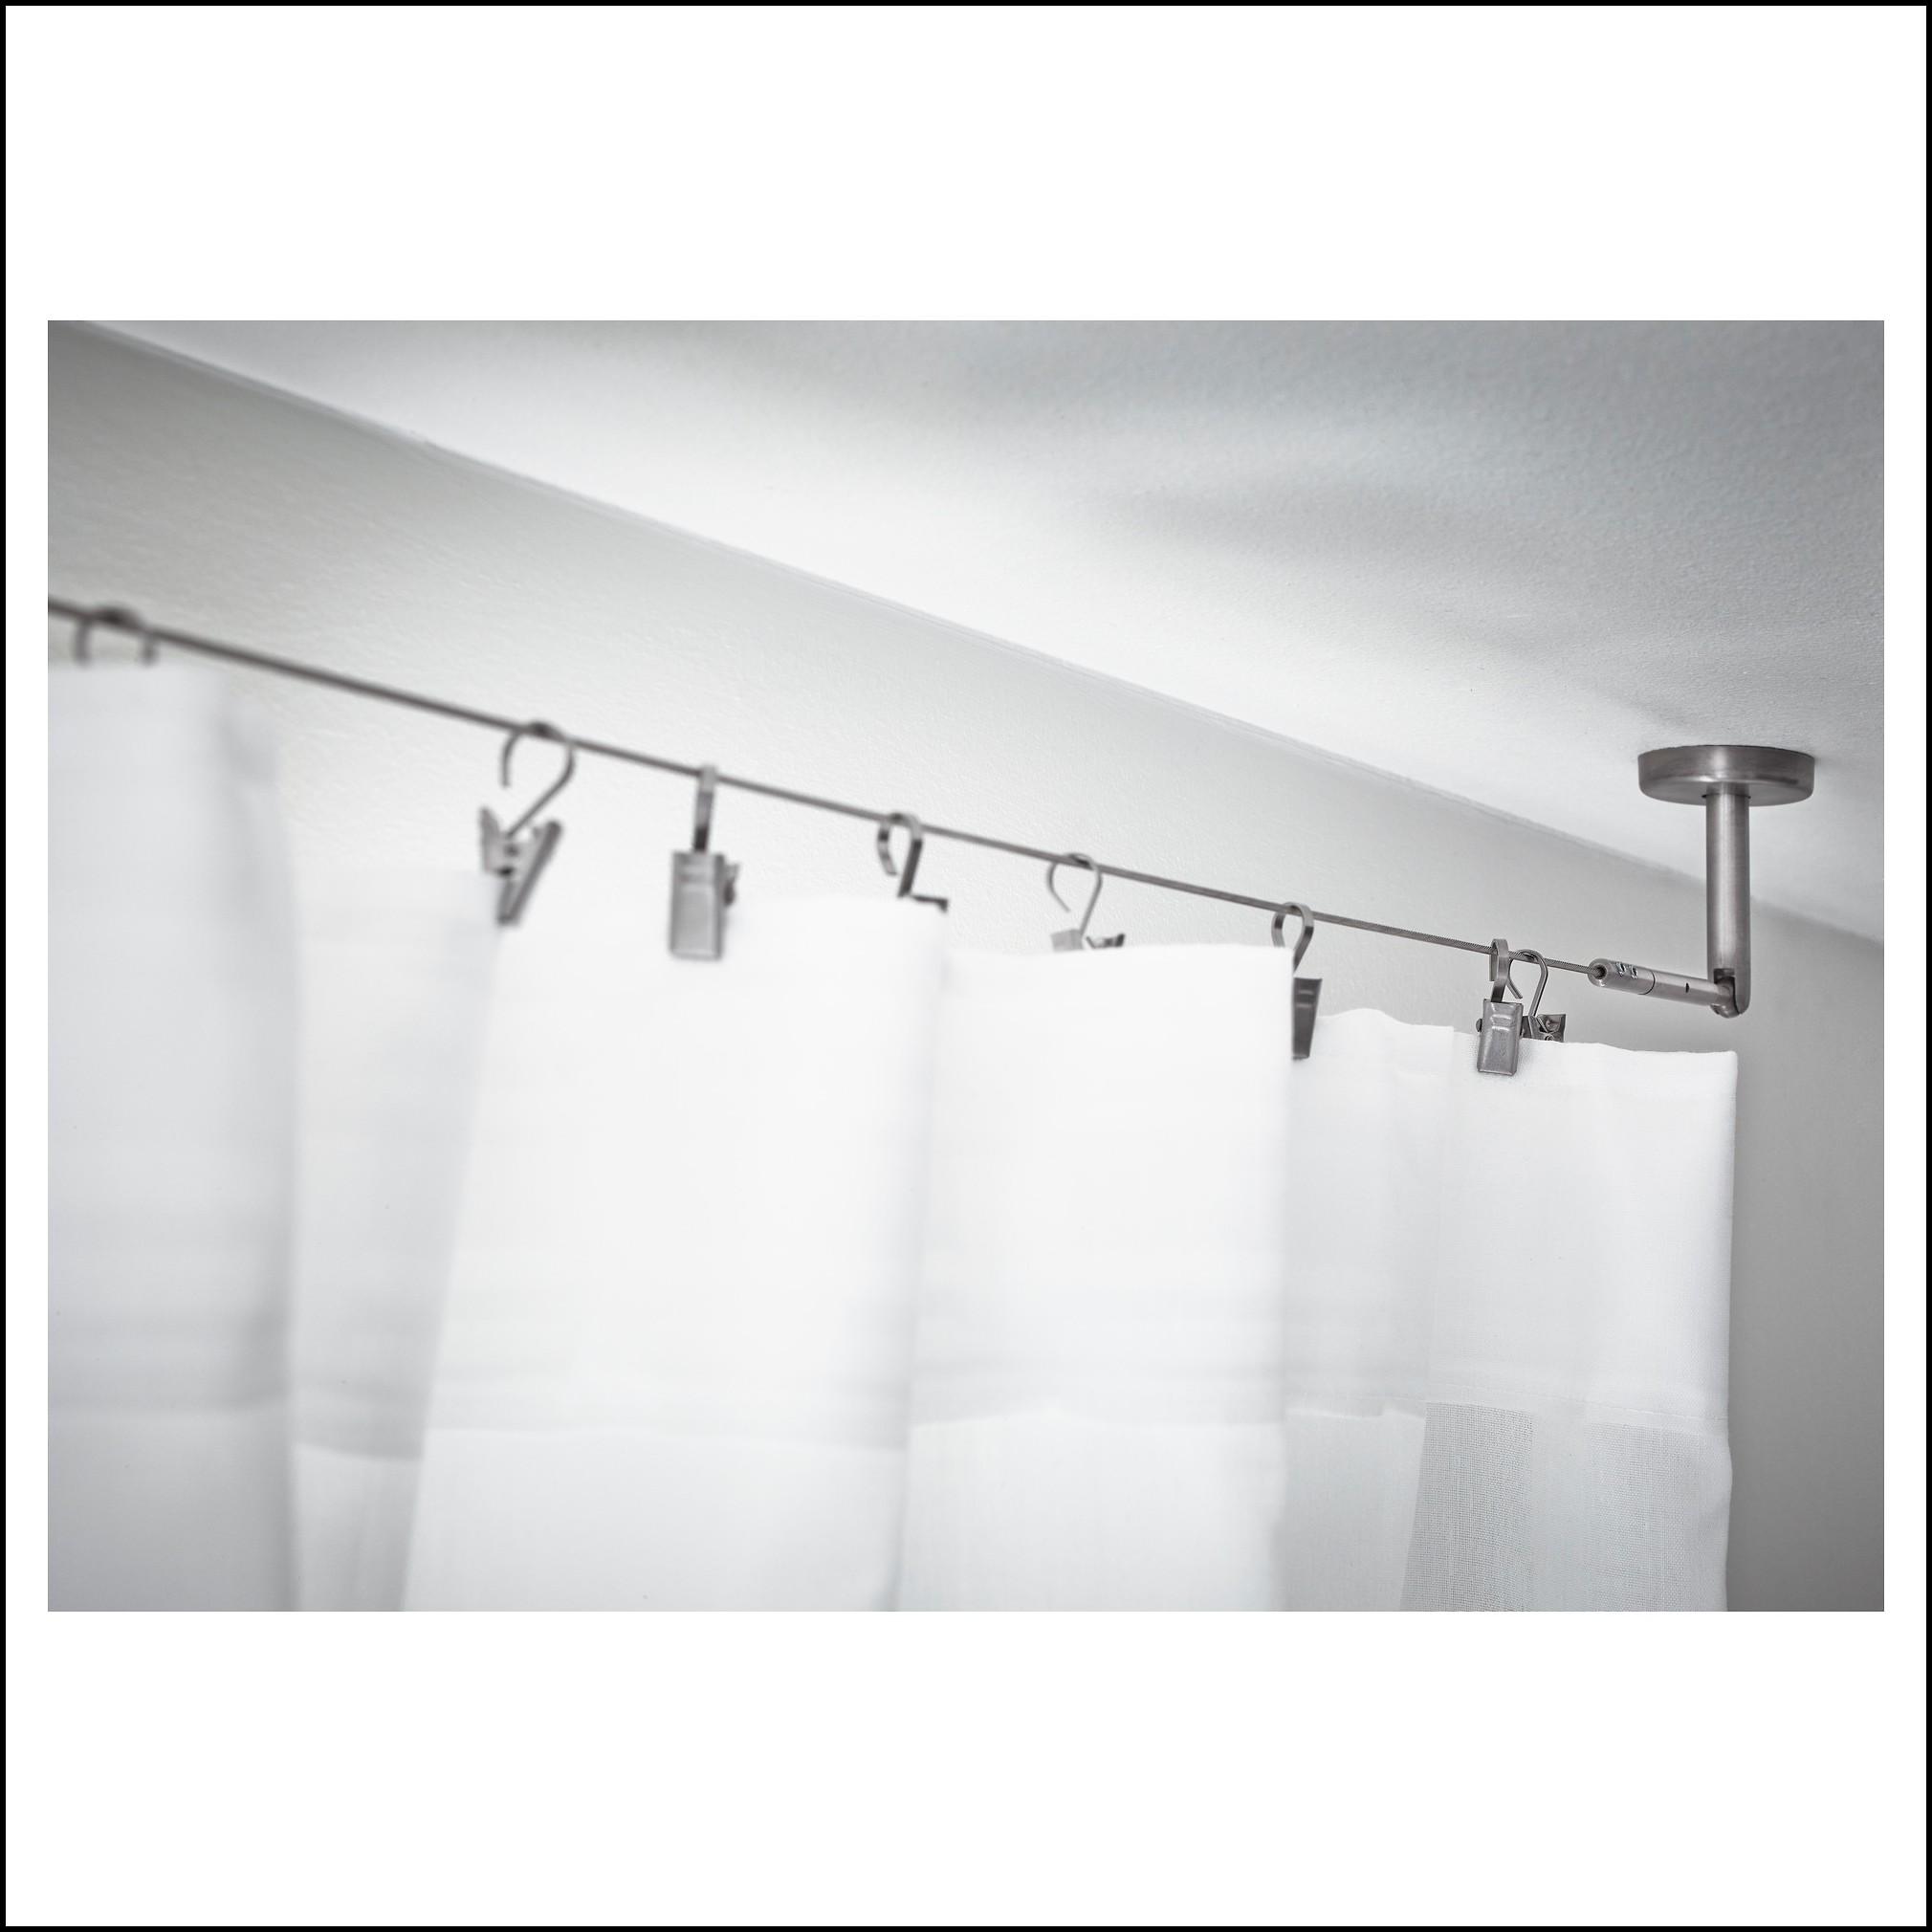 Ikea Curtain Wire Samyysandra